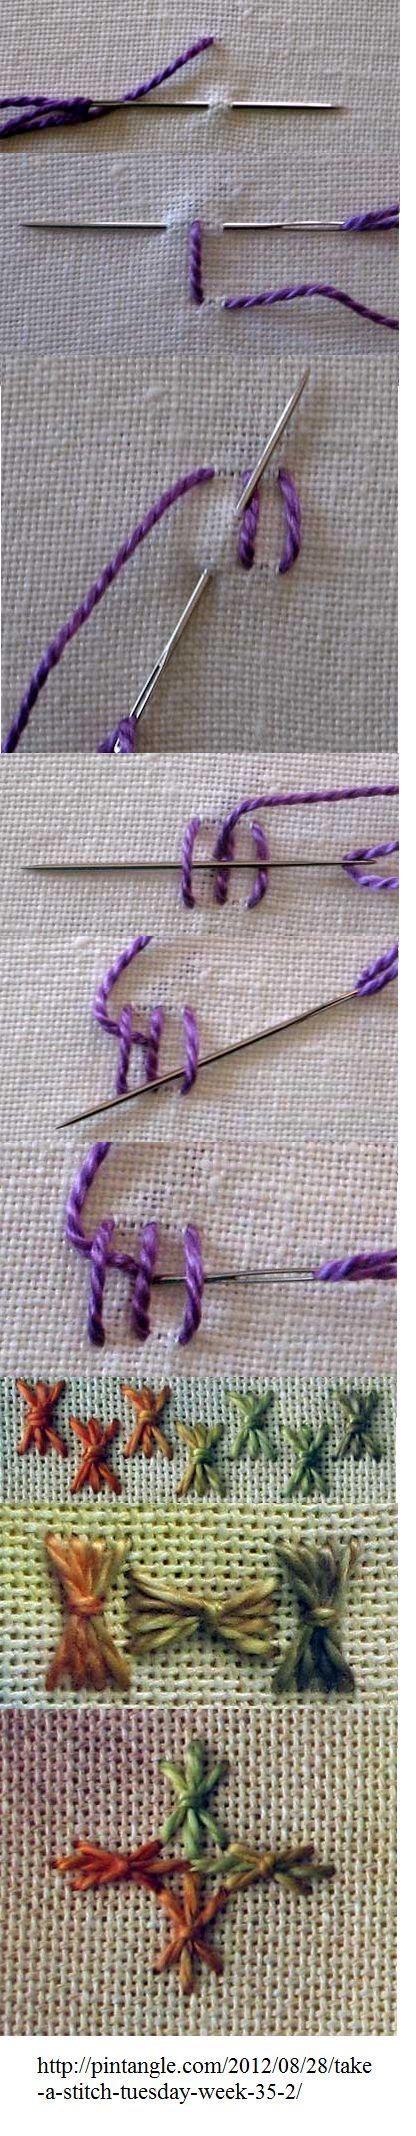 sheafs stitch